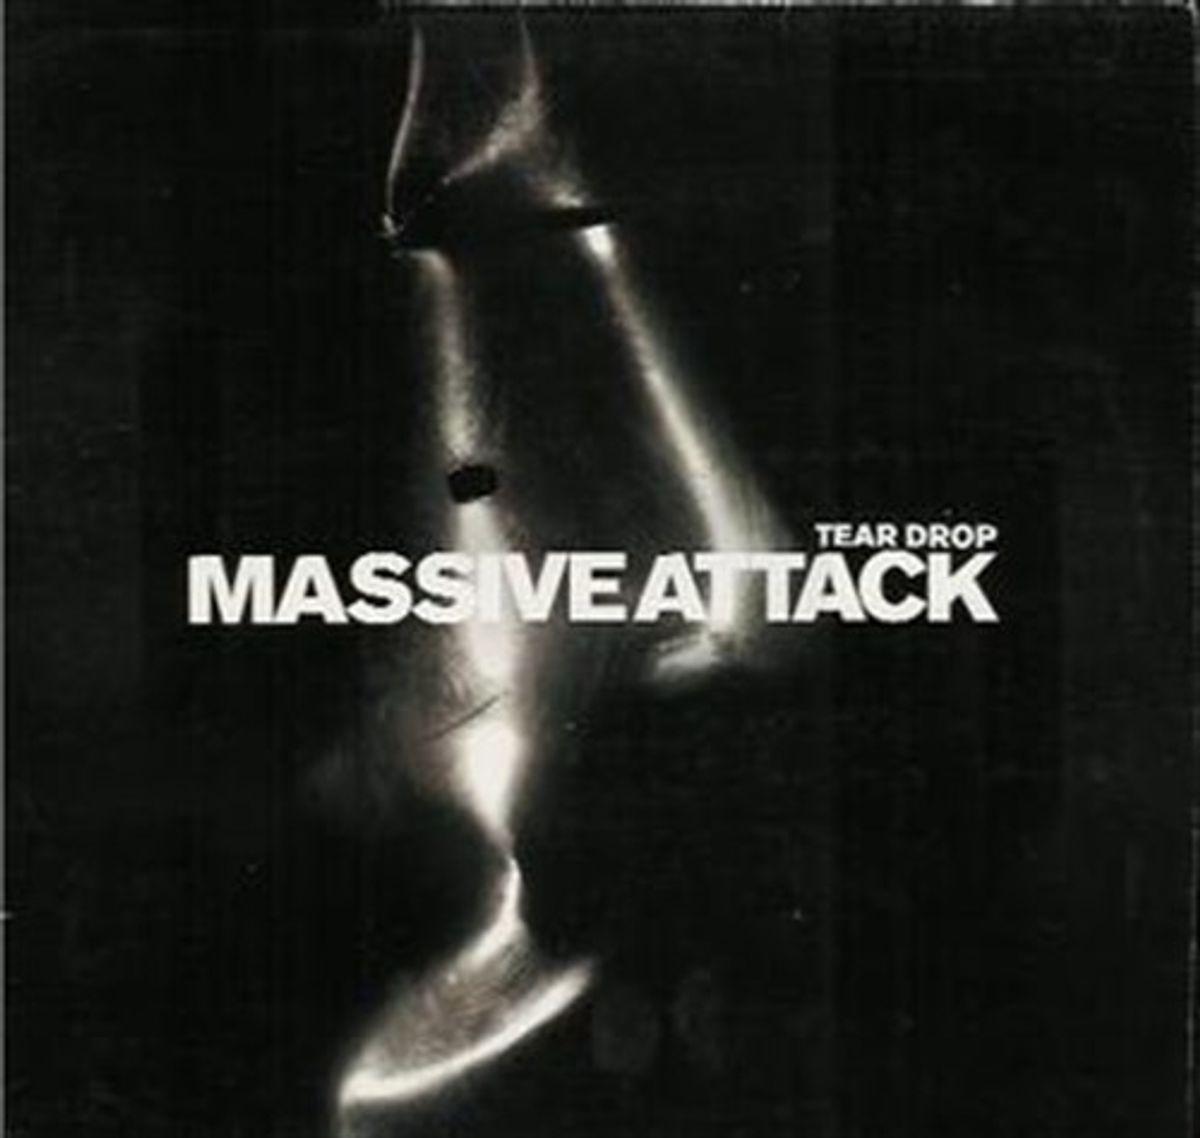 #Tranen - Massive Attack - Teardrop (1998)